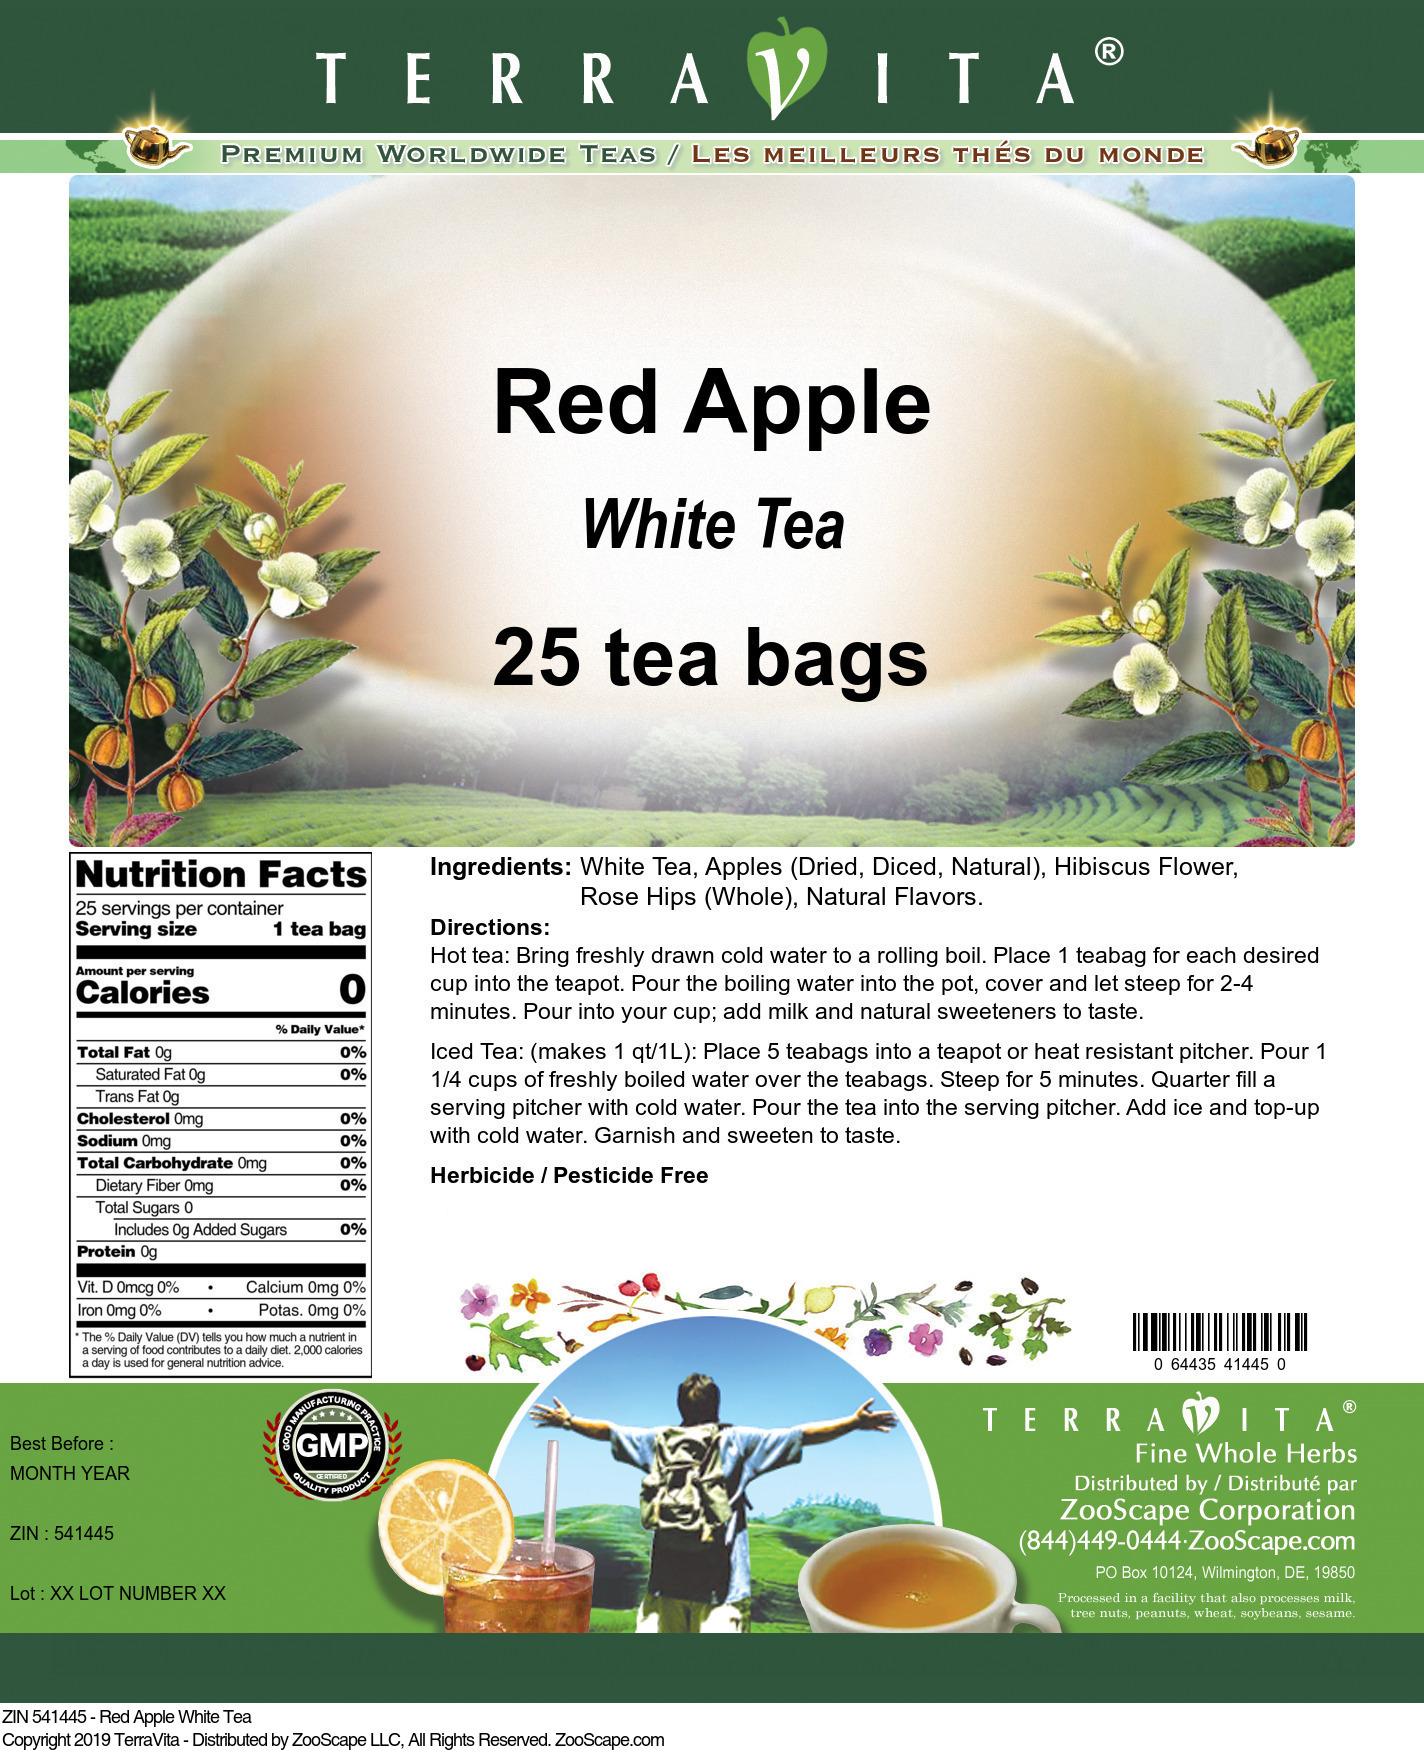 Red Apple White Tea